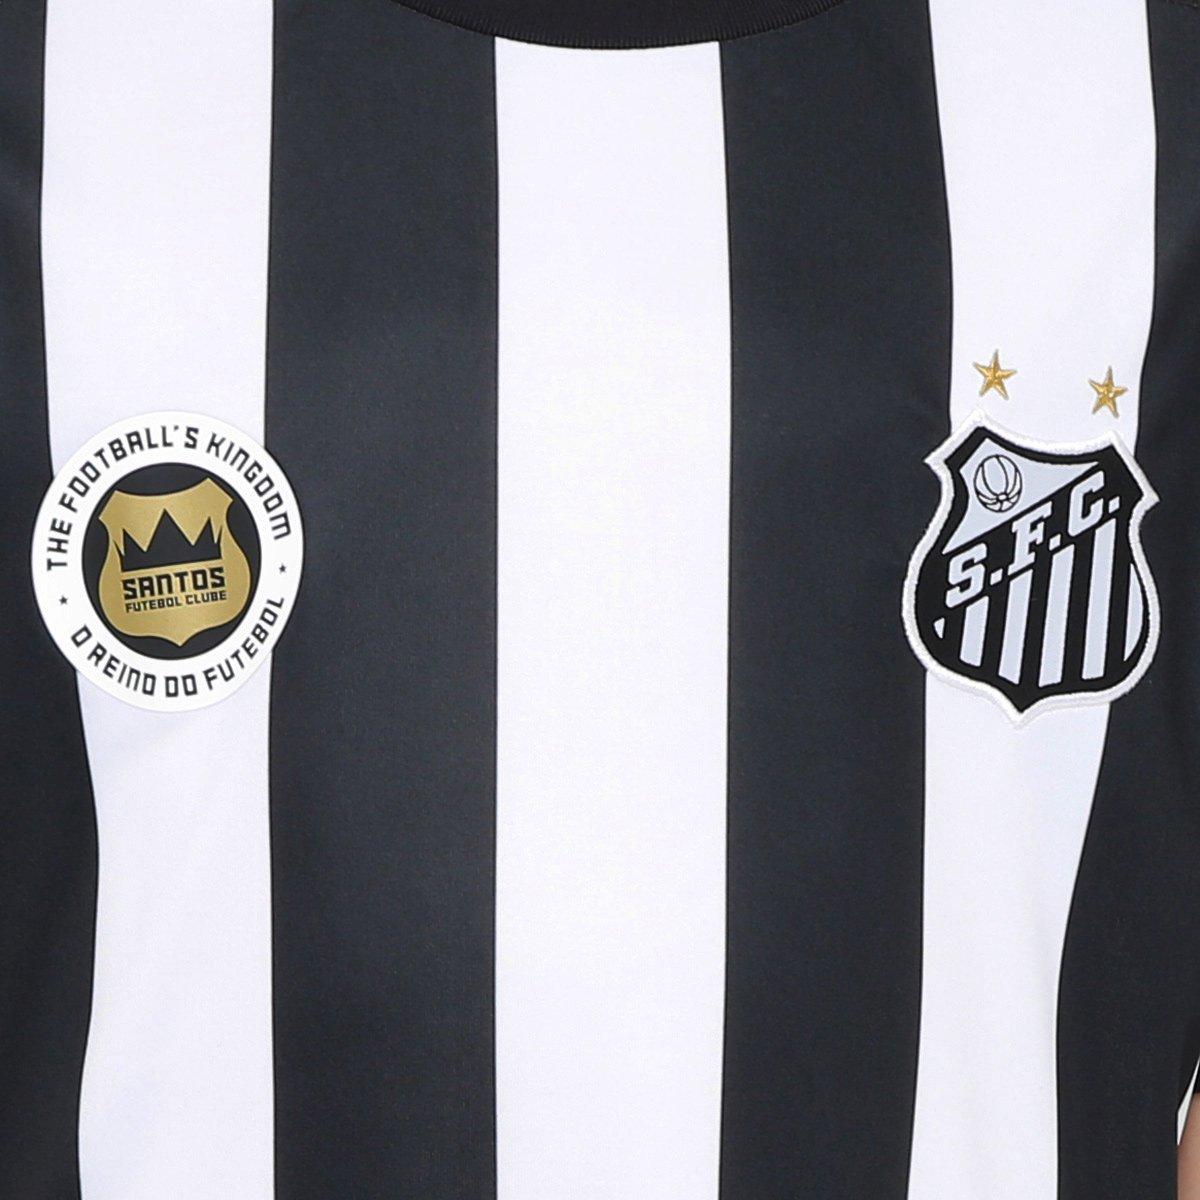 c69735f9b2 Camisa Santos Infantil II 17 18 s nº Réplica Torcedor Kappa - Compre ...